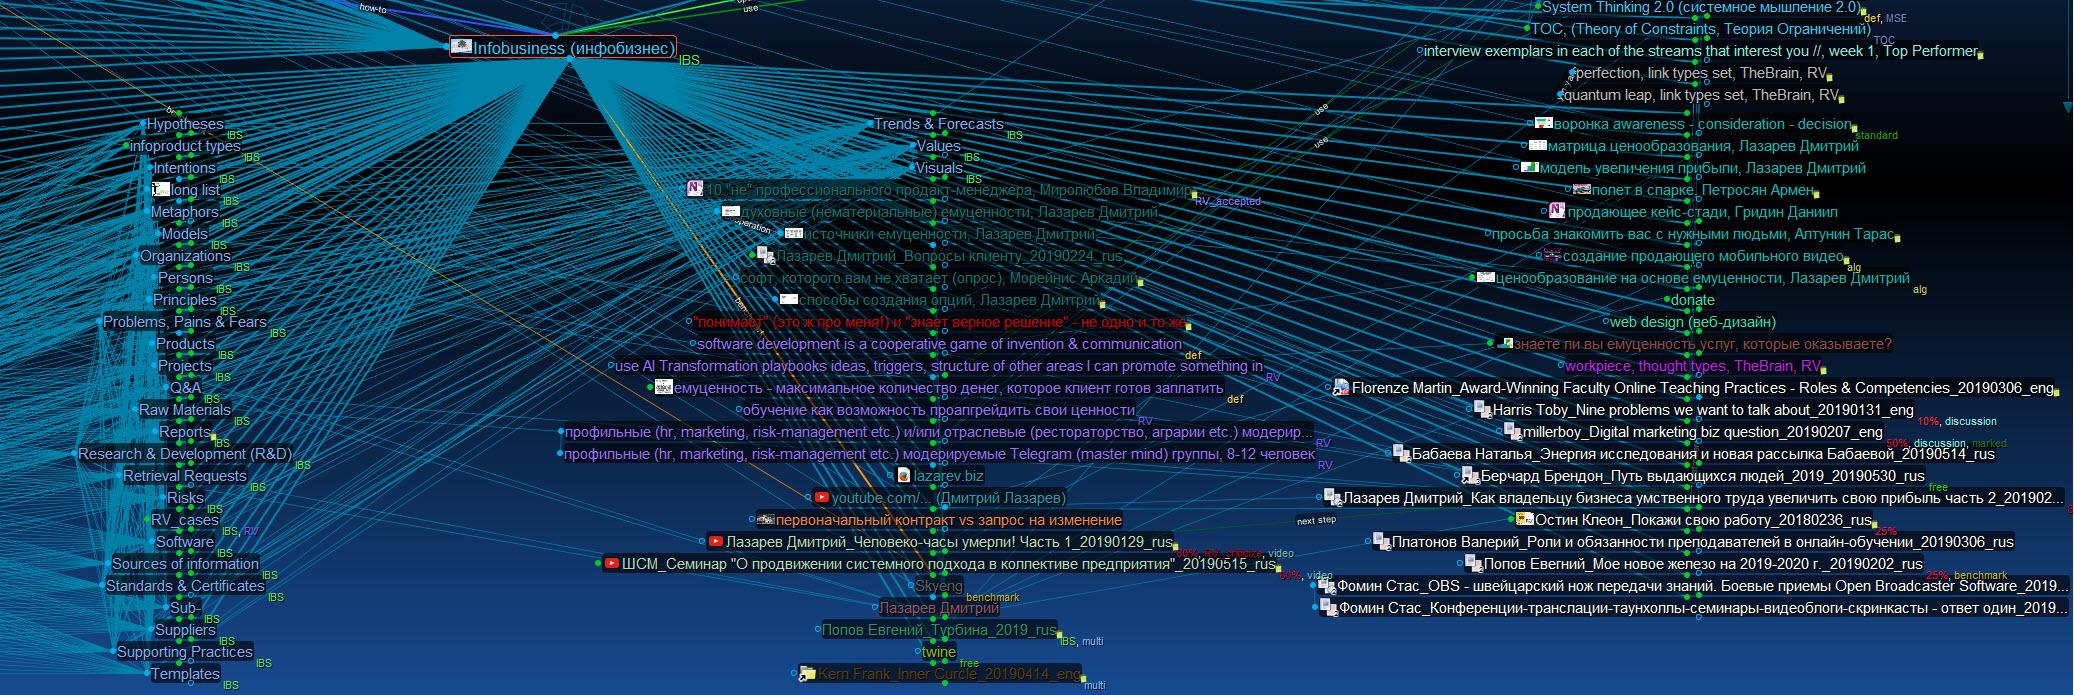 RV_Infobusiness (part)_20190605.jpg